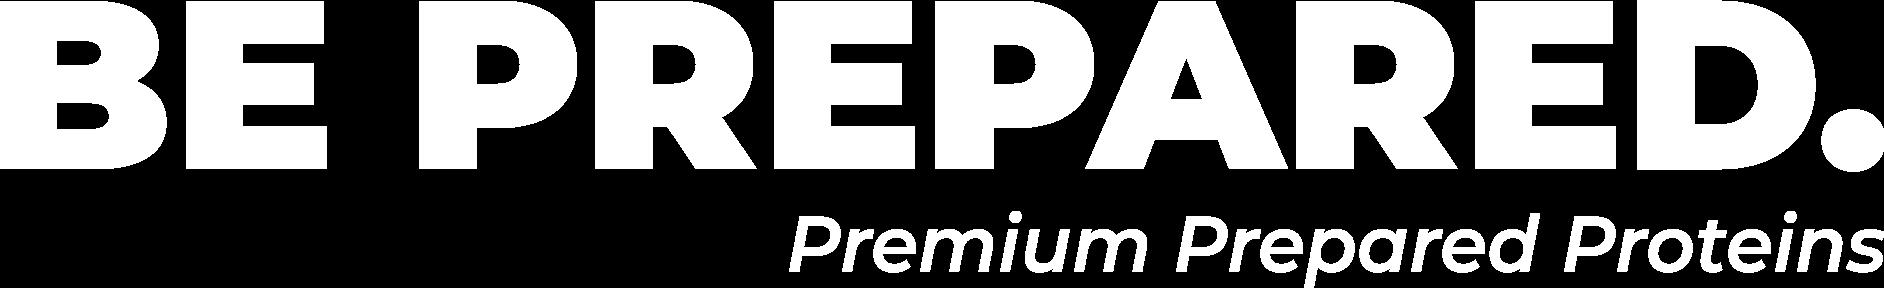 Be Prepared. Premium Prepared Proteins